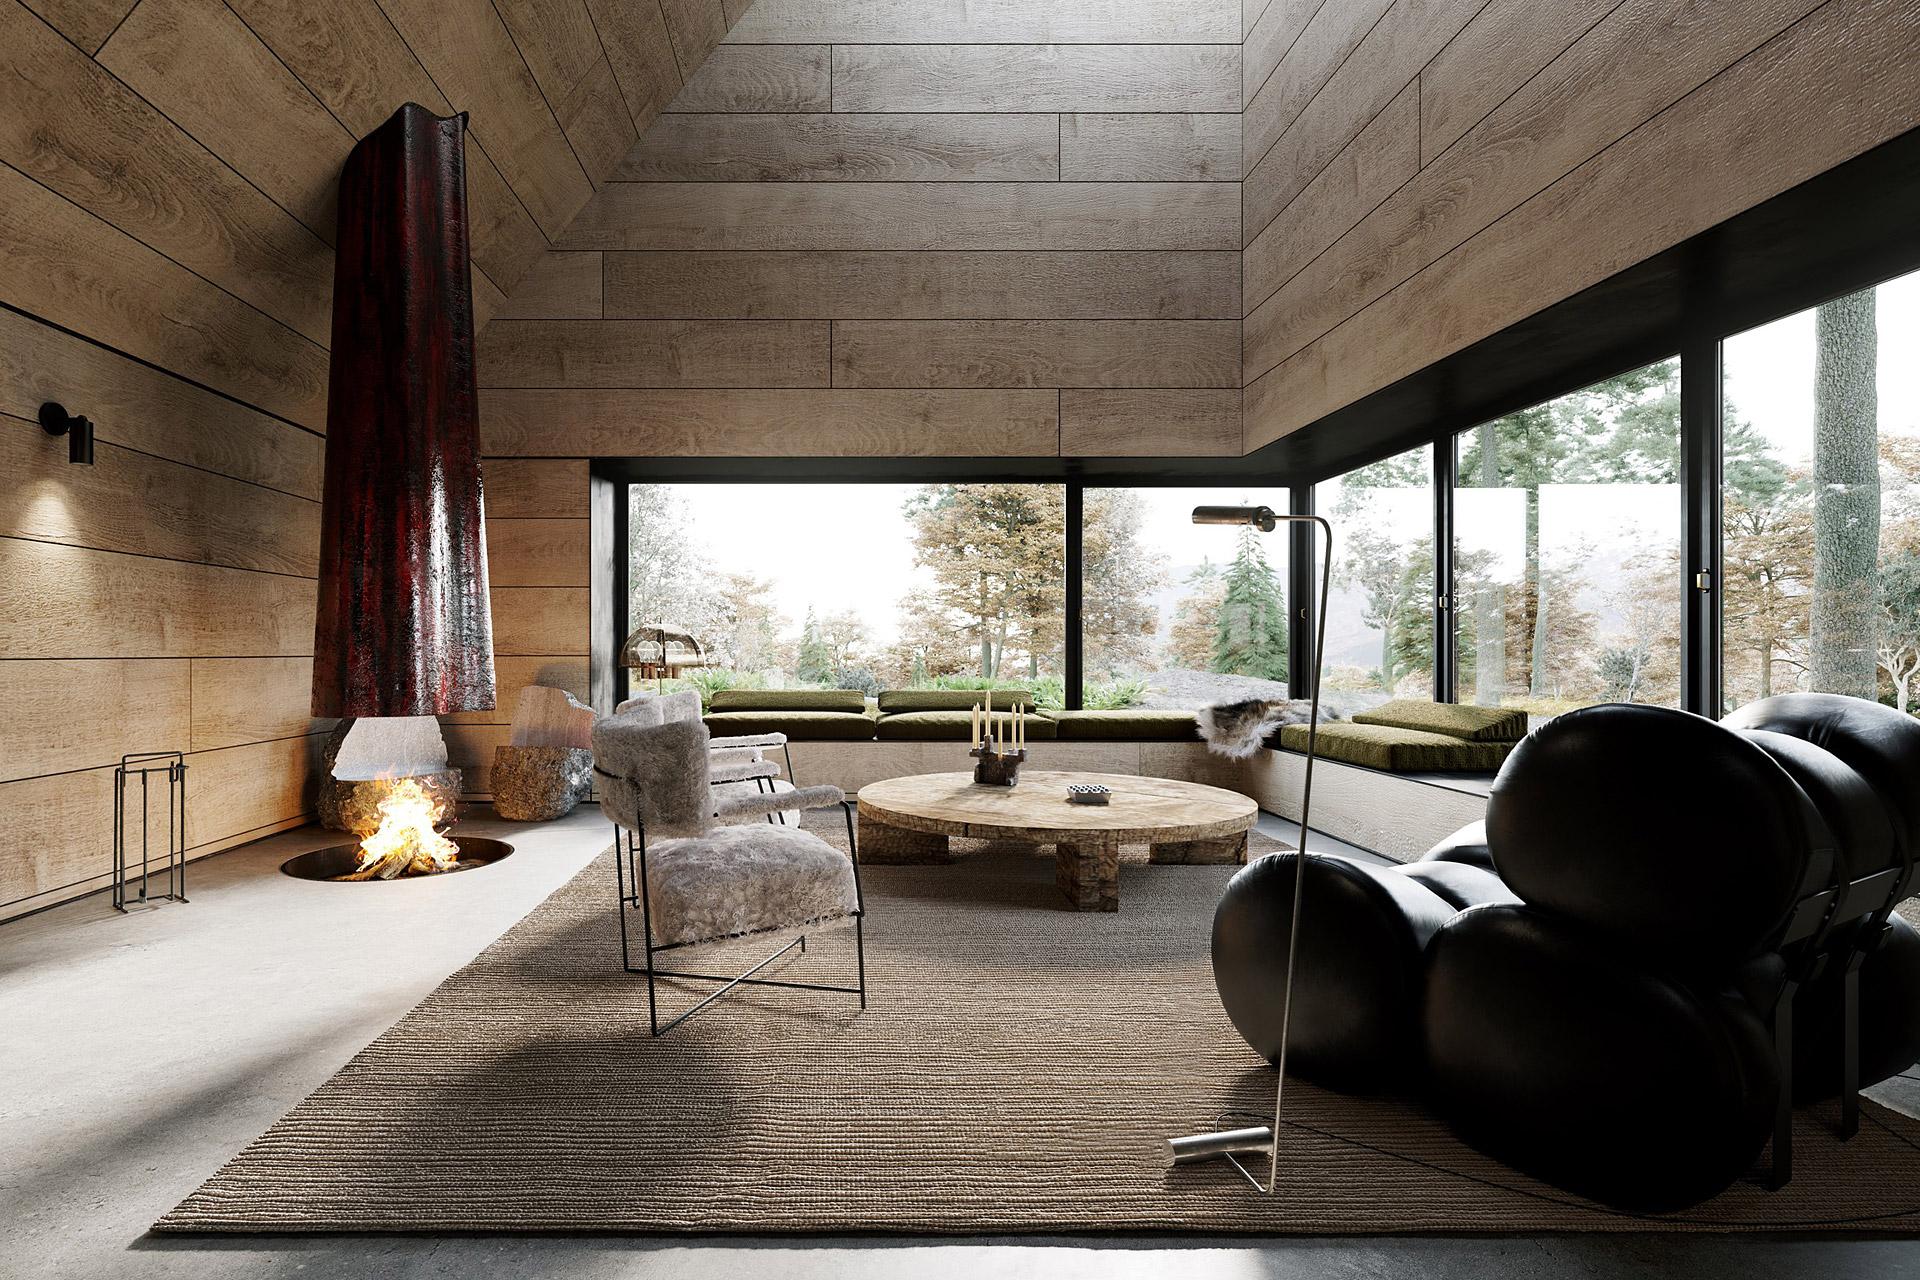 Interior Design/Architecture - Magazine cover